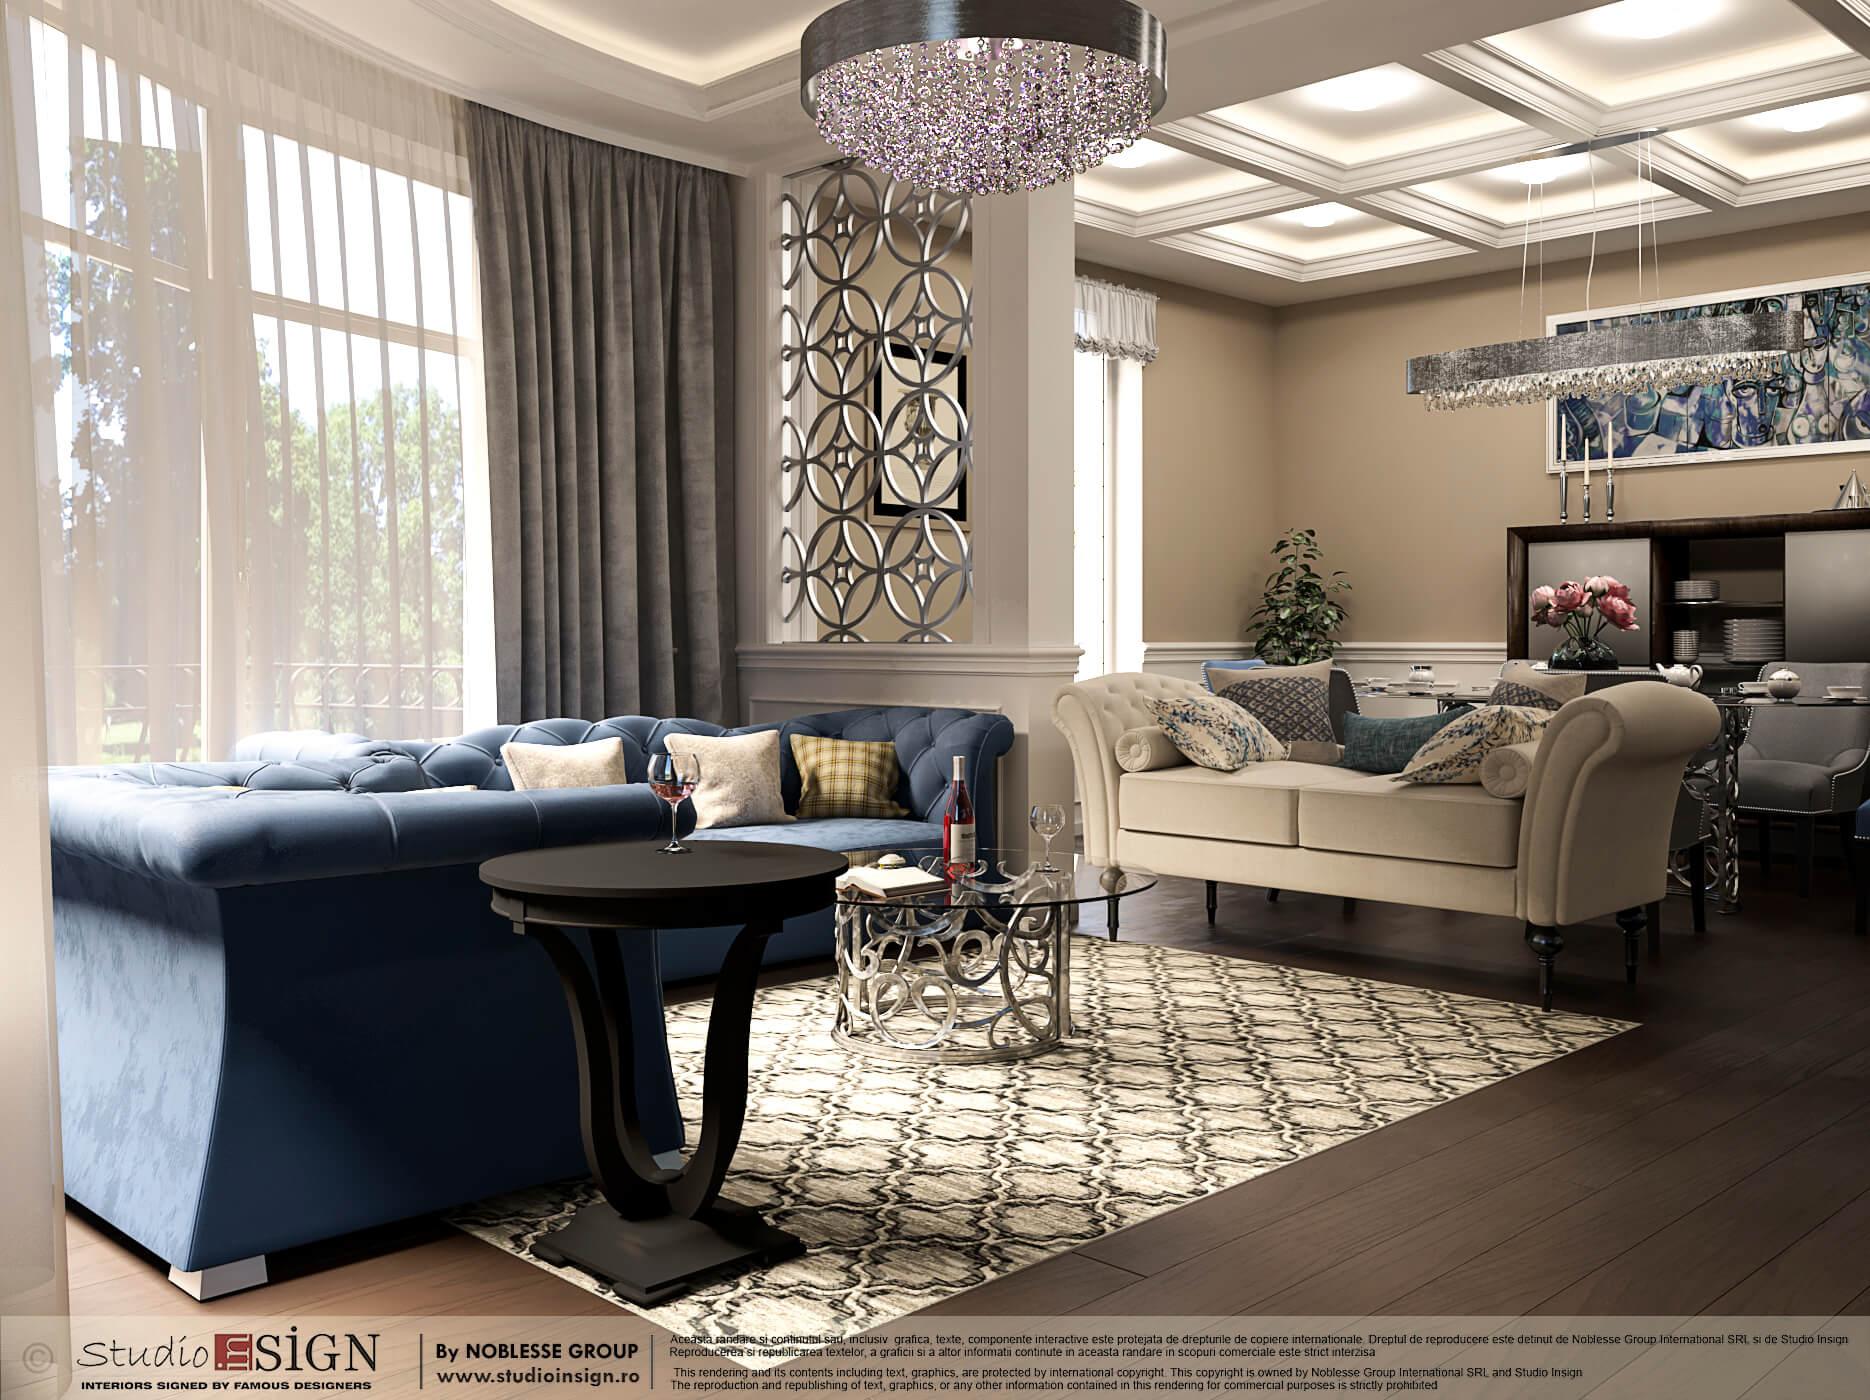 HOUSE IN PIPERA COLONIAL STYLE INTERIOR DESIGN Studio inSIGN